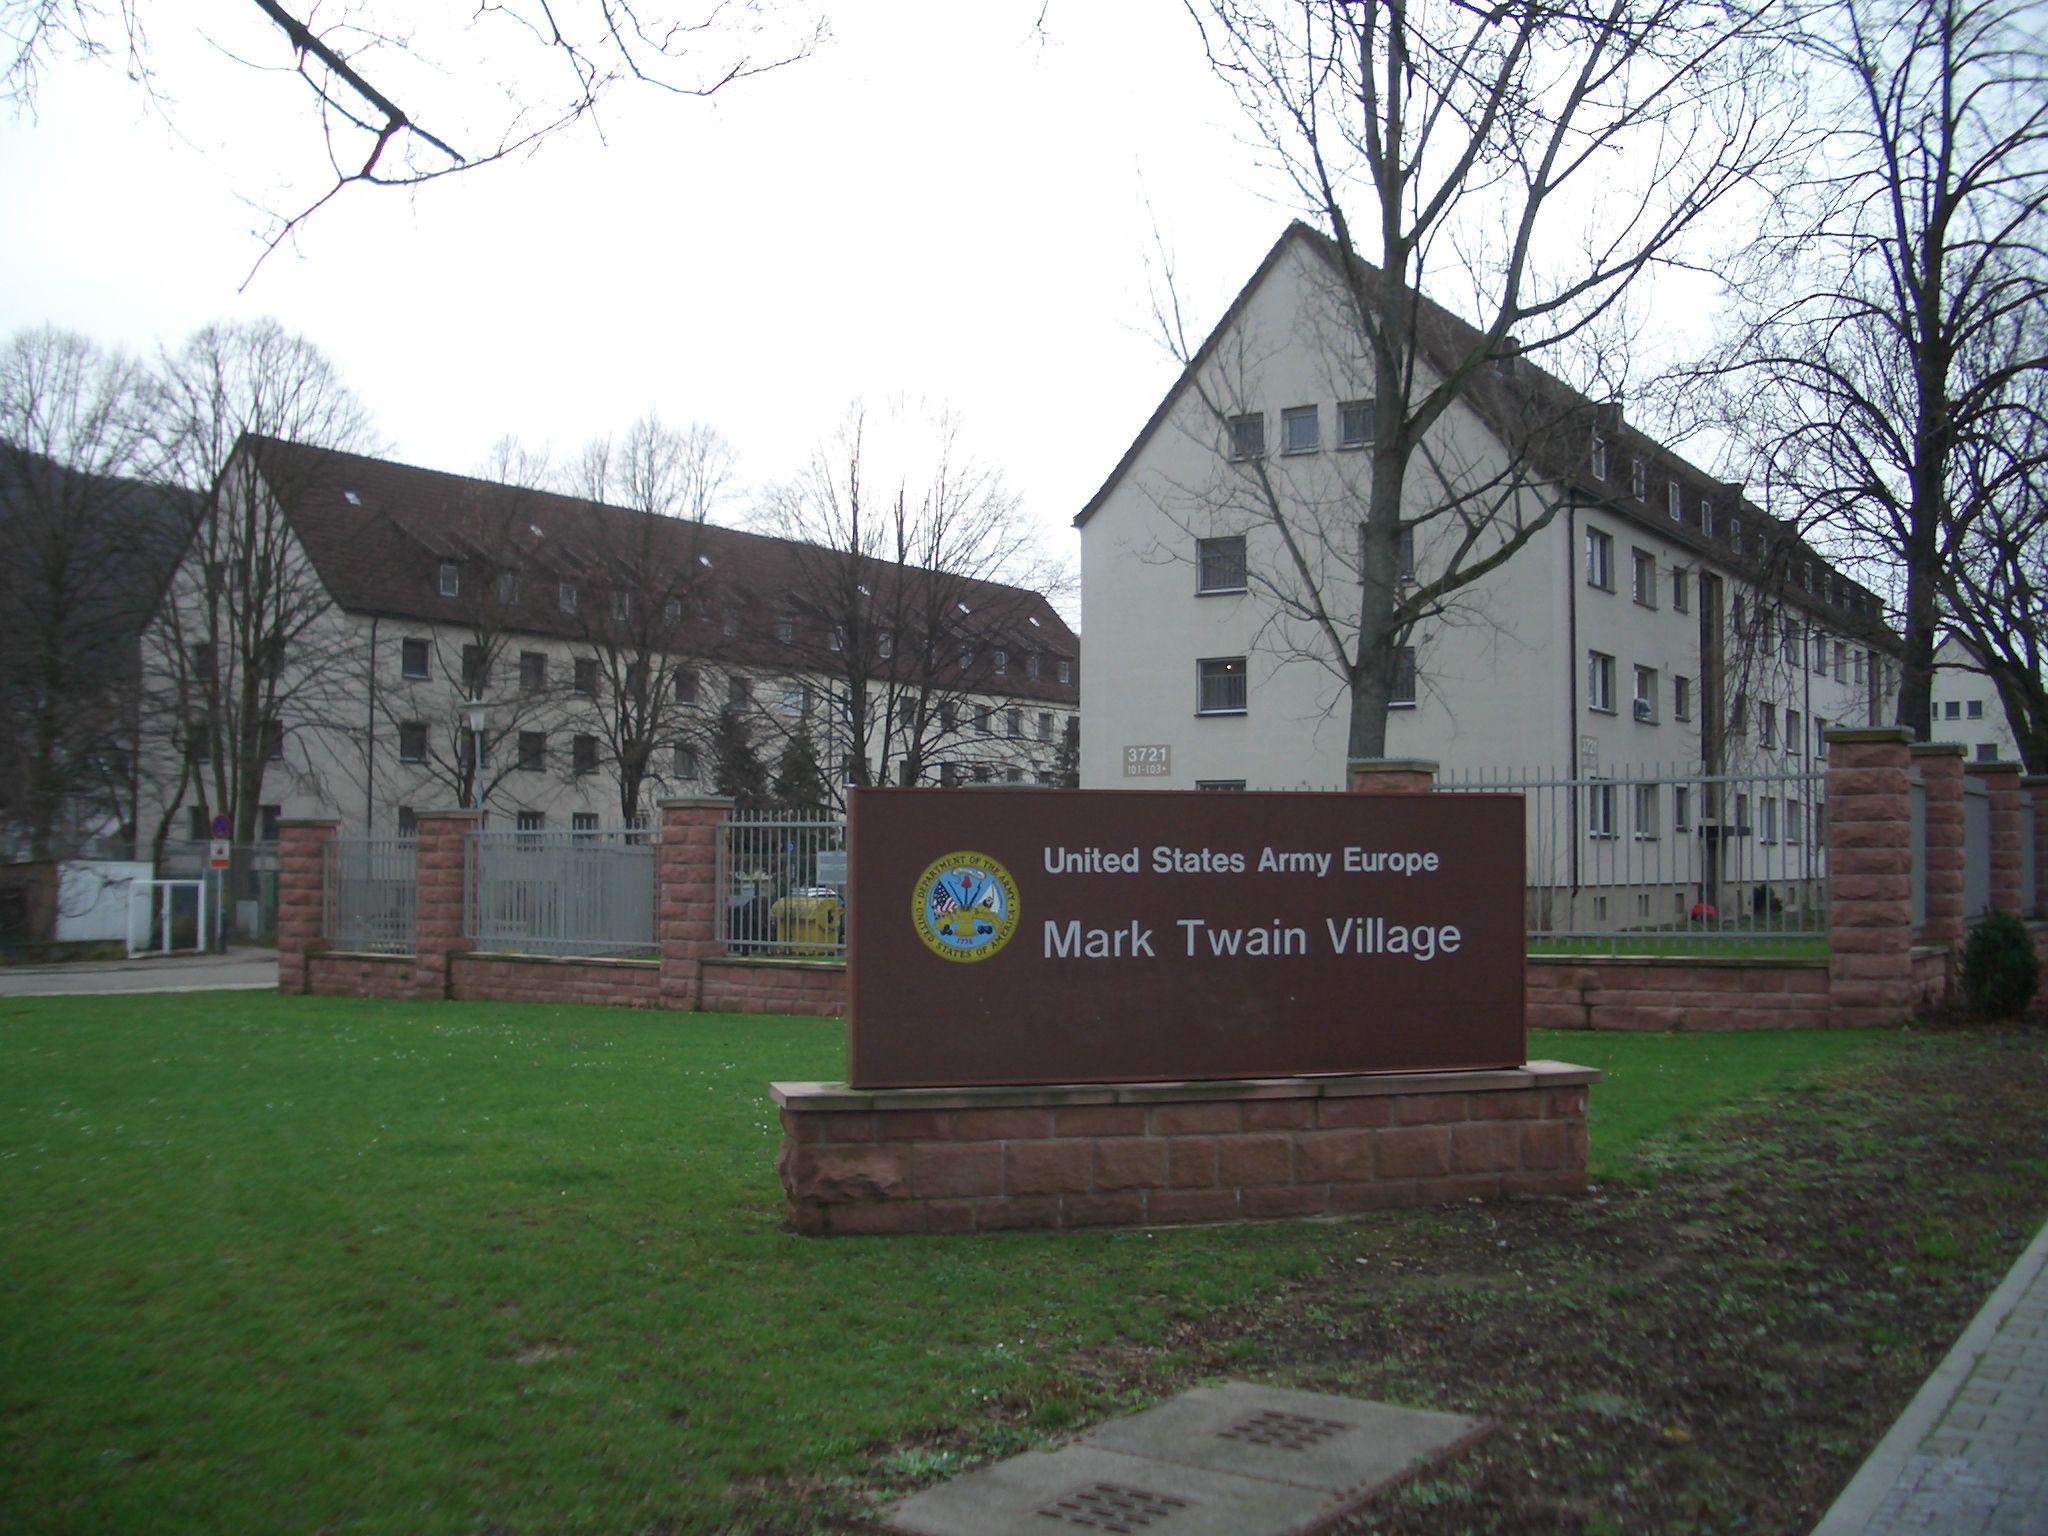 33 Holbeinring Mark Twain Village Heidelberg FRG Home 19791982